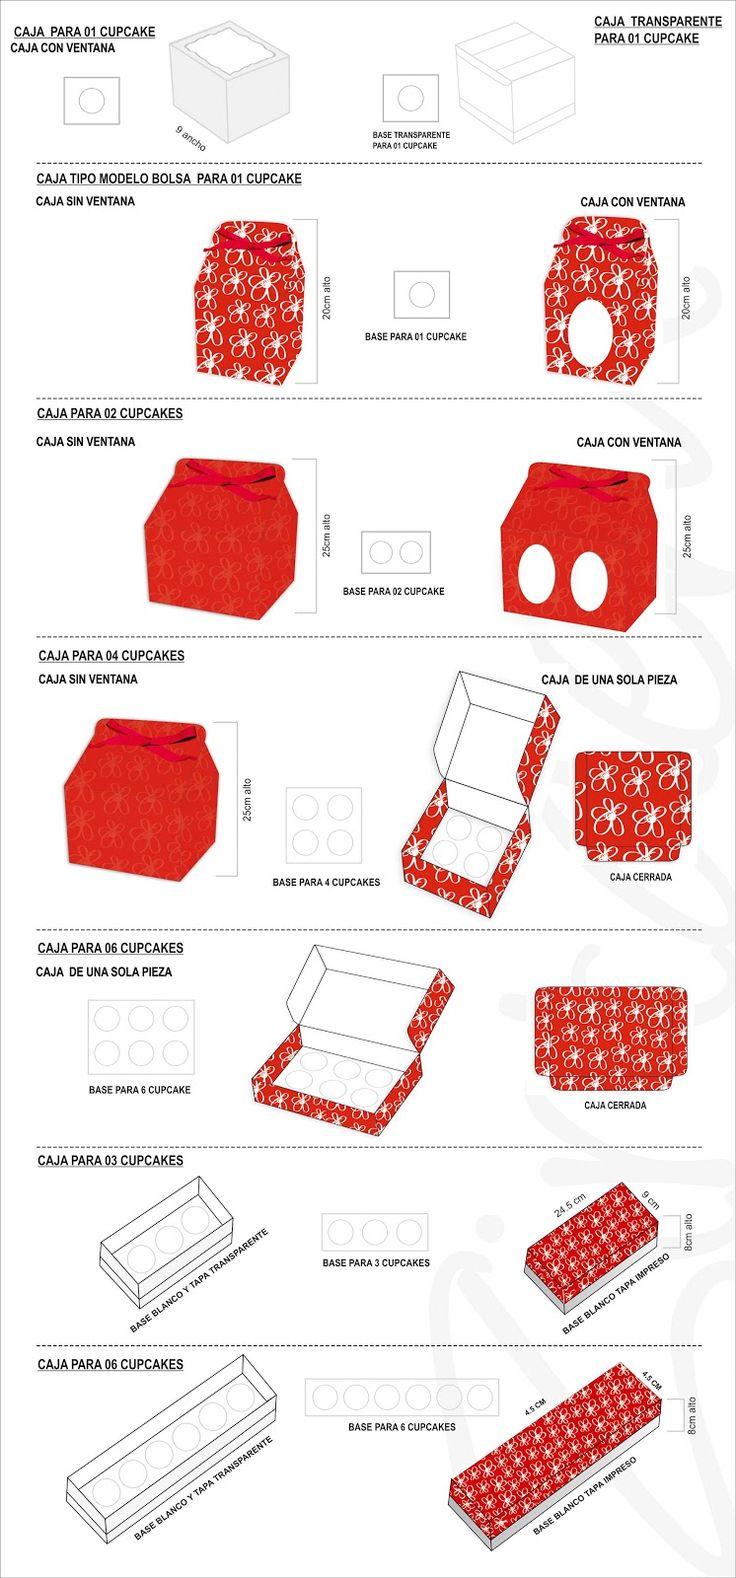 255 best box cupcakes images by yaret gallardo on Pinterest | Box ...